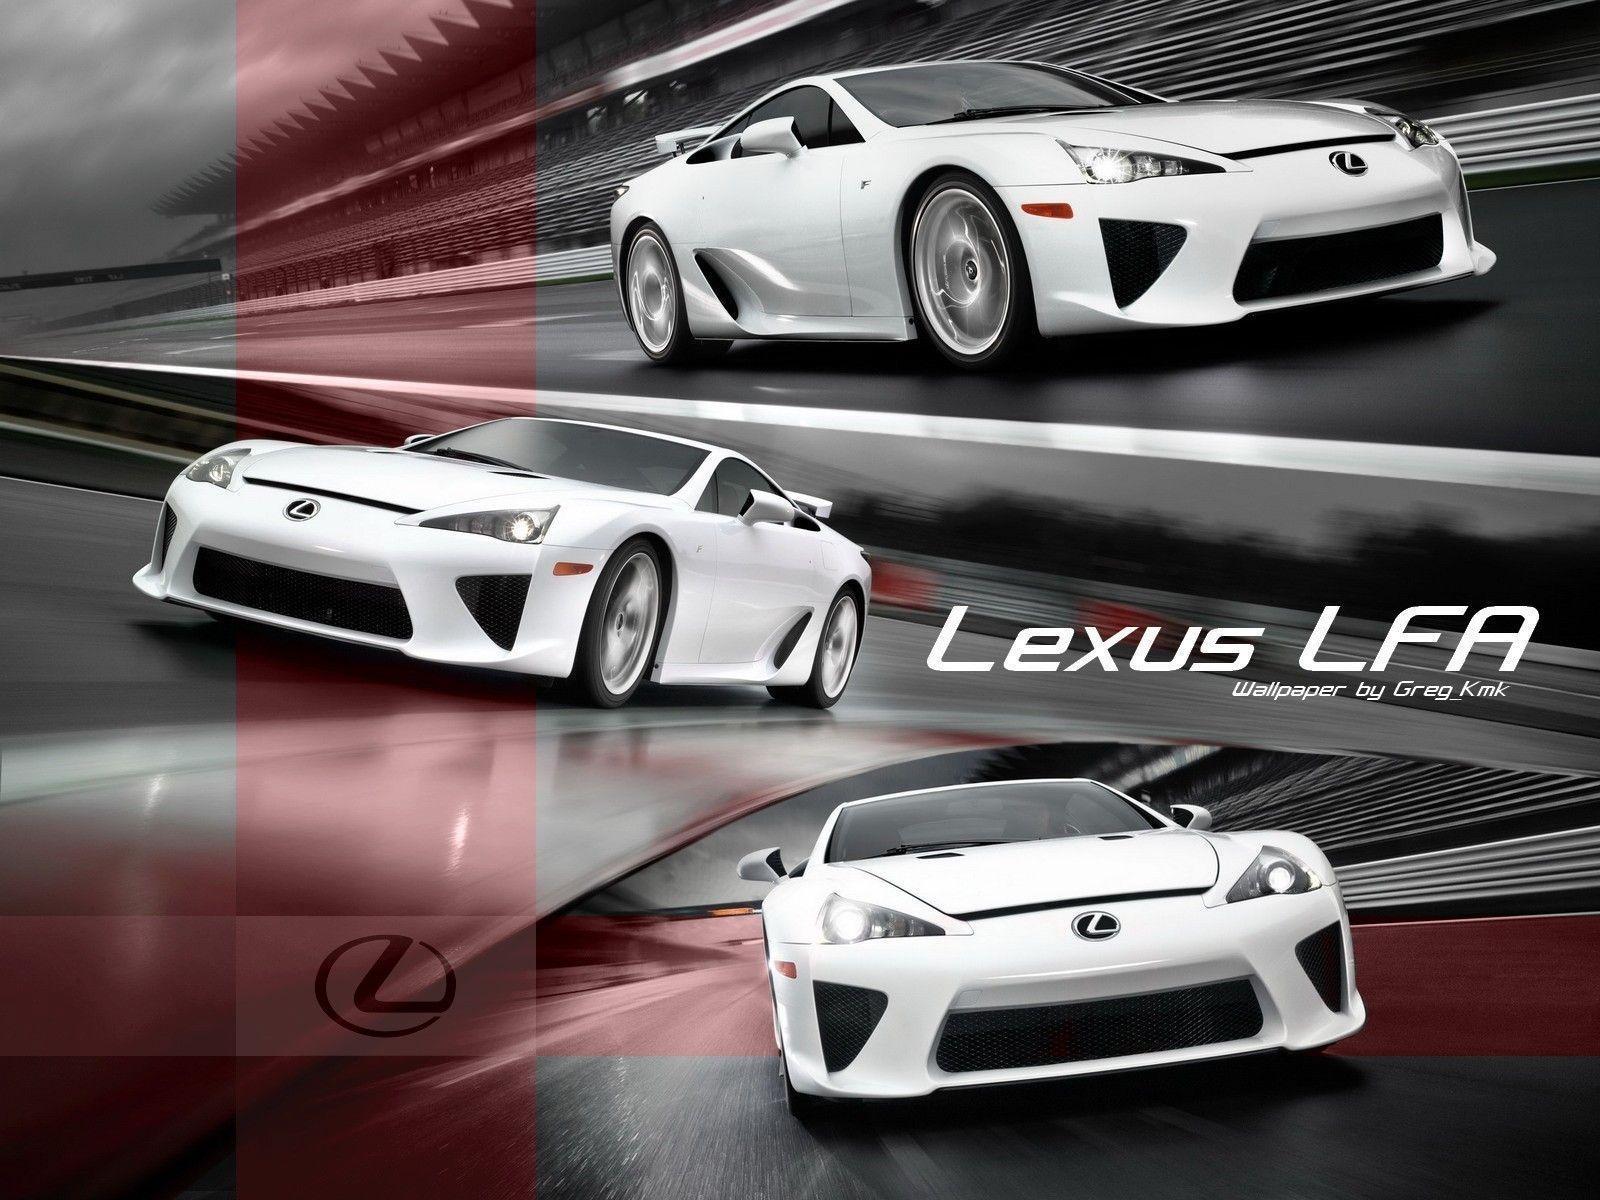 2012 lexus lfa wallpapers wallpaper cave